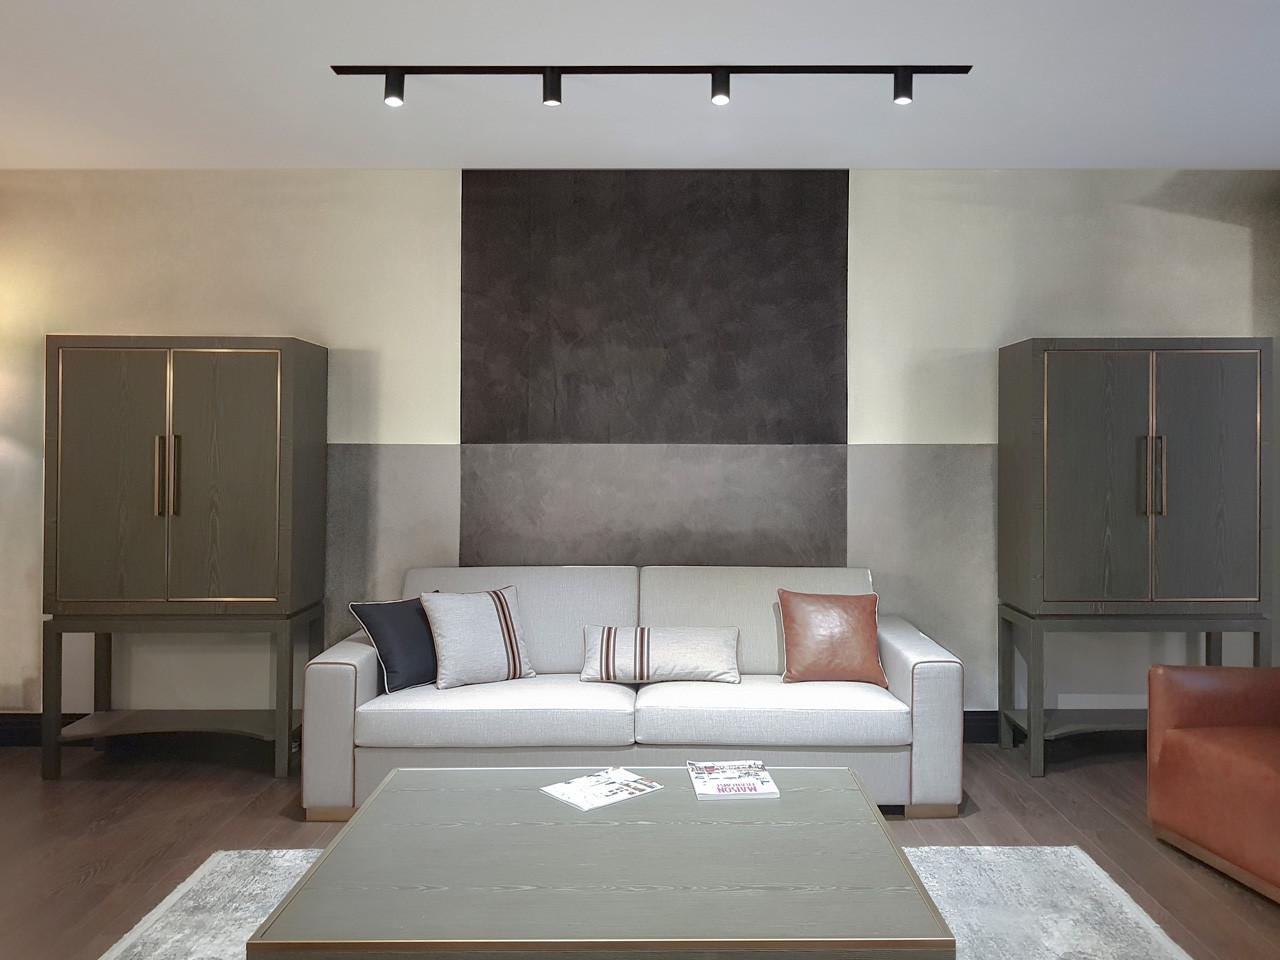 Mantovano Wall 03.jpg